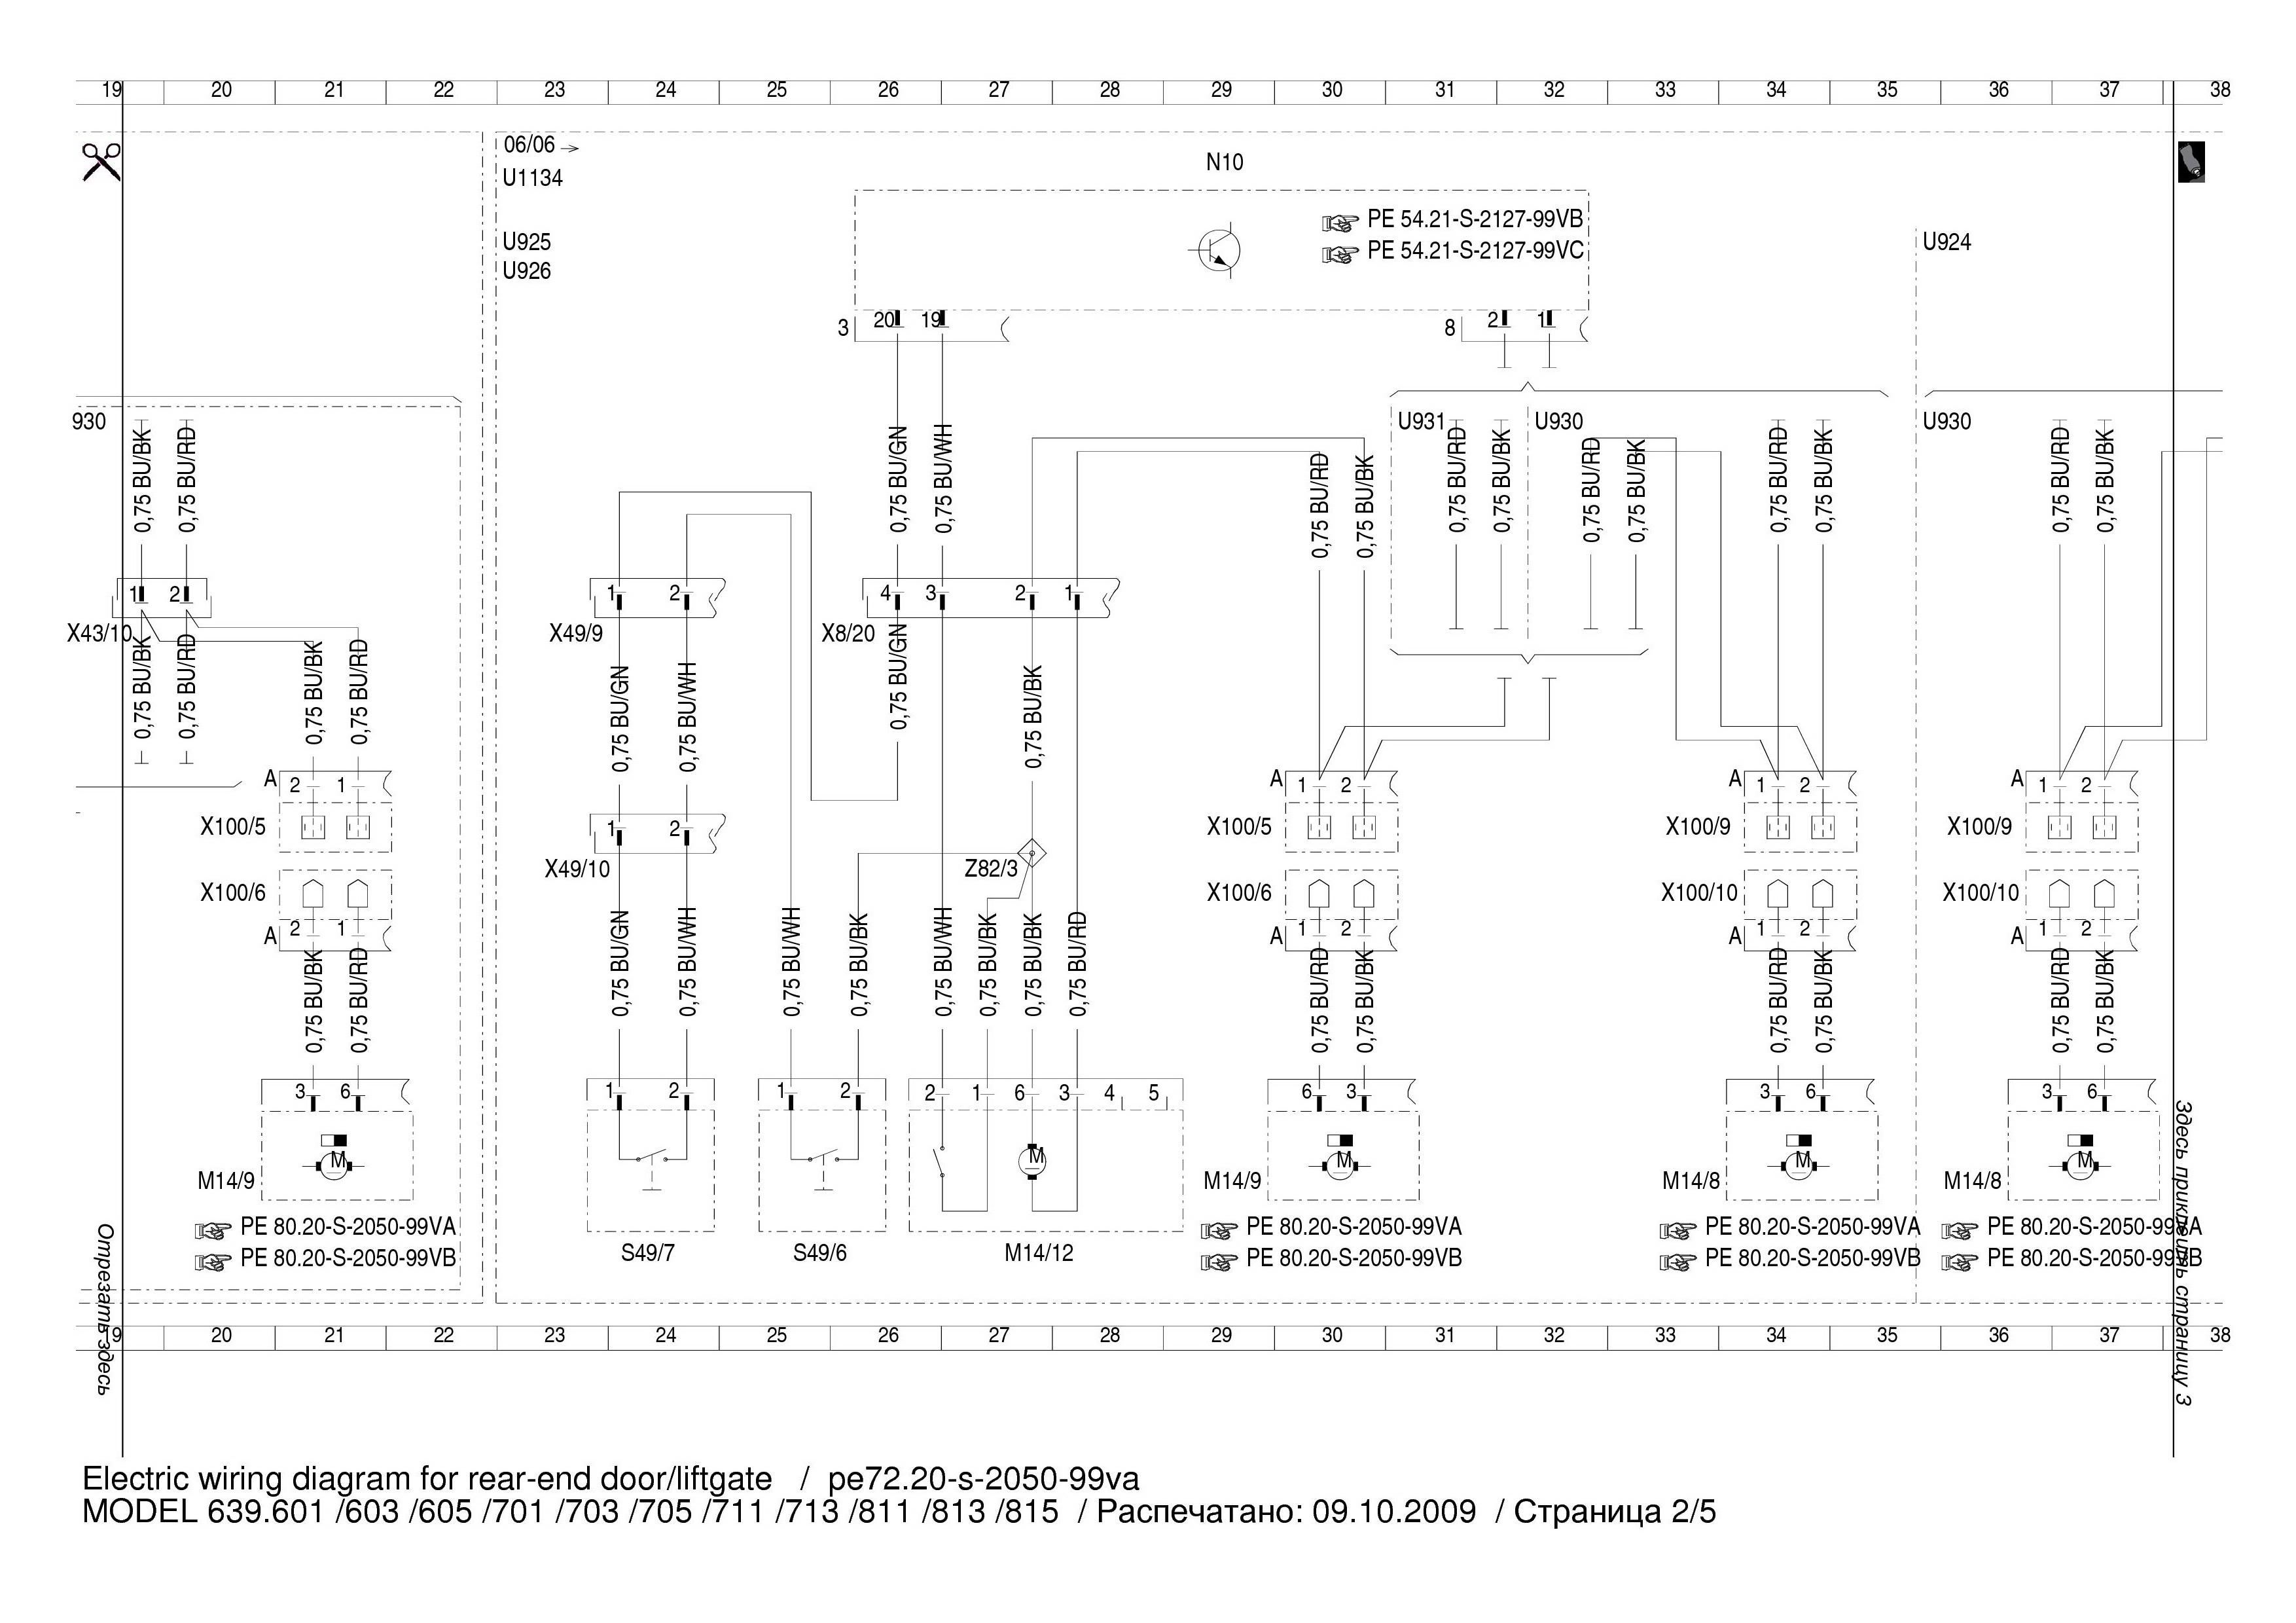 Vito 639 115 Cdi  U041f U0440 U043e U0431 U043b U0435 U043c U044b  U0441  U0446 U0435 U043d U0442 U0440 U0430 U043b U044c U043d U044b U043c  U0437 U0430 U043c U043a U043e U043c